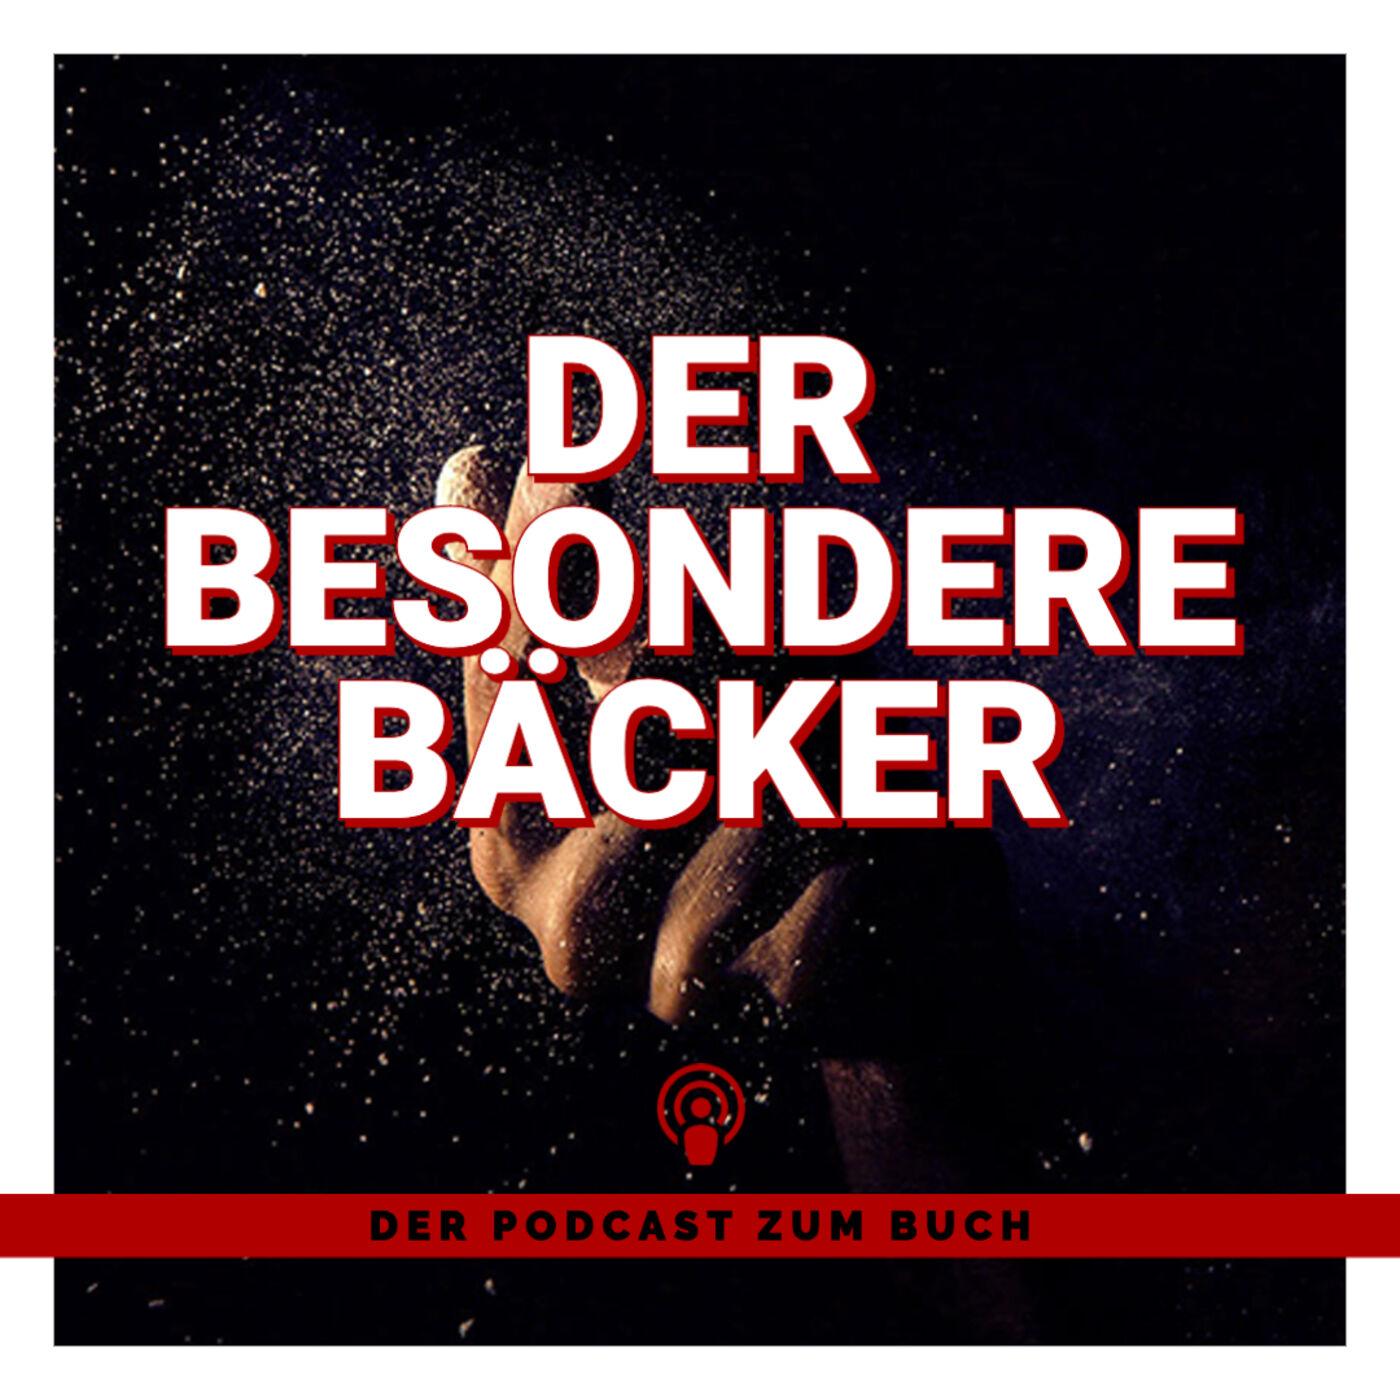 Artwork for podcast DER BESONDERE BÄCKER